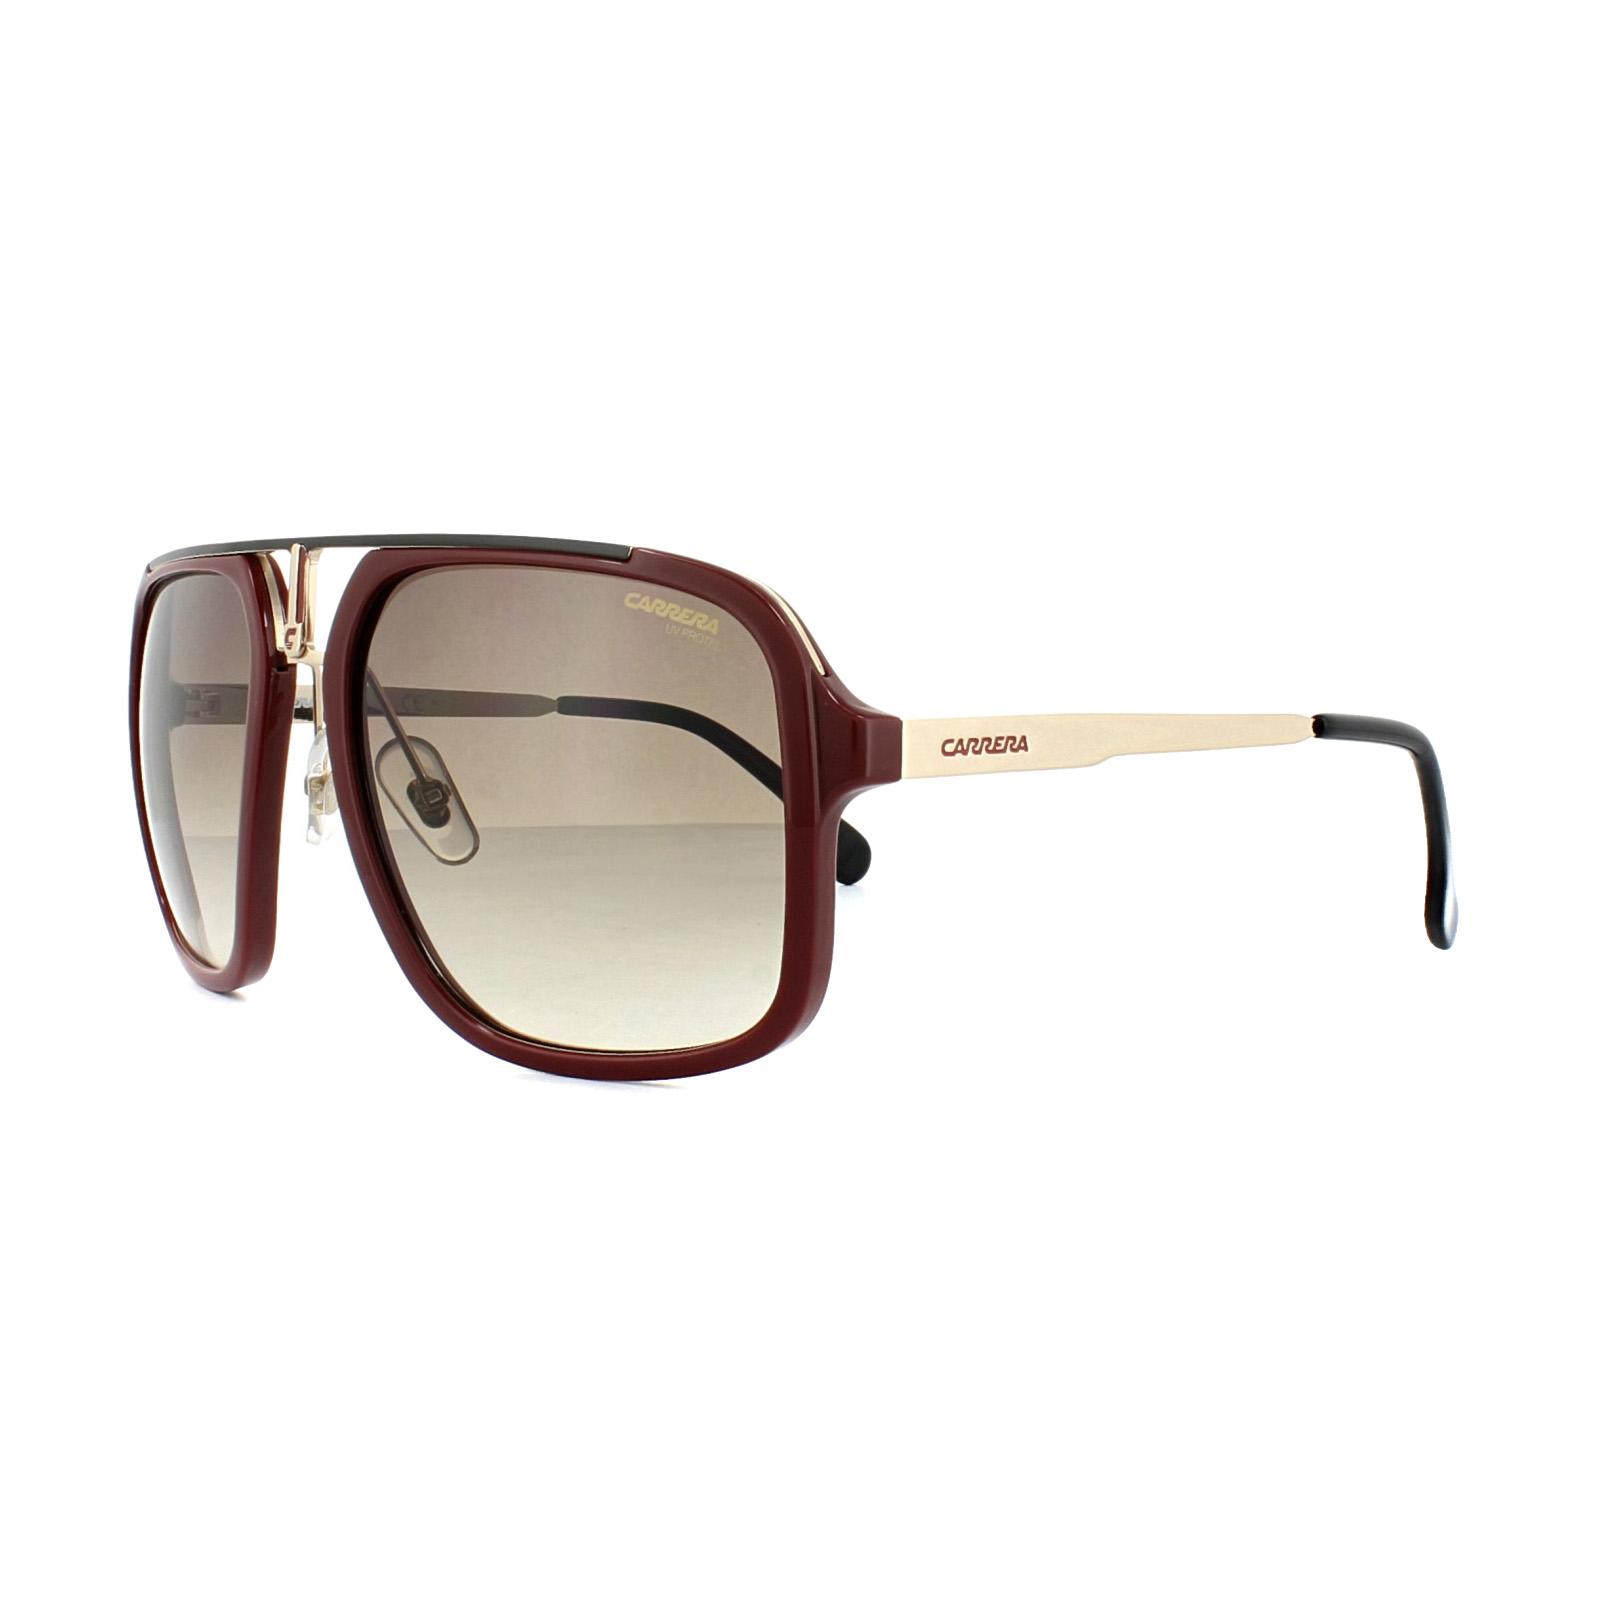 ed9b4f6c941e Sentinel Carrera Sunglasses 1004/S AU2 HA Red Black Gold Brown Gradient